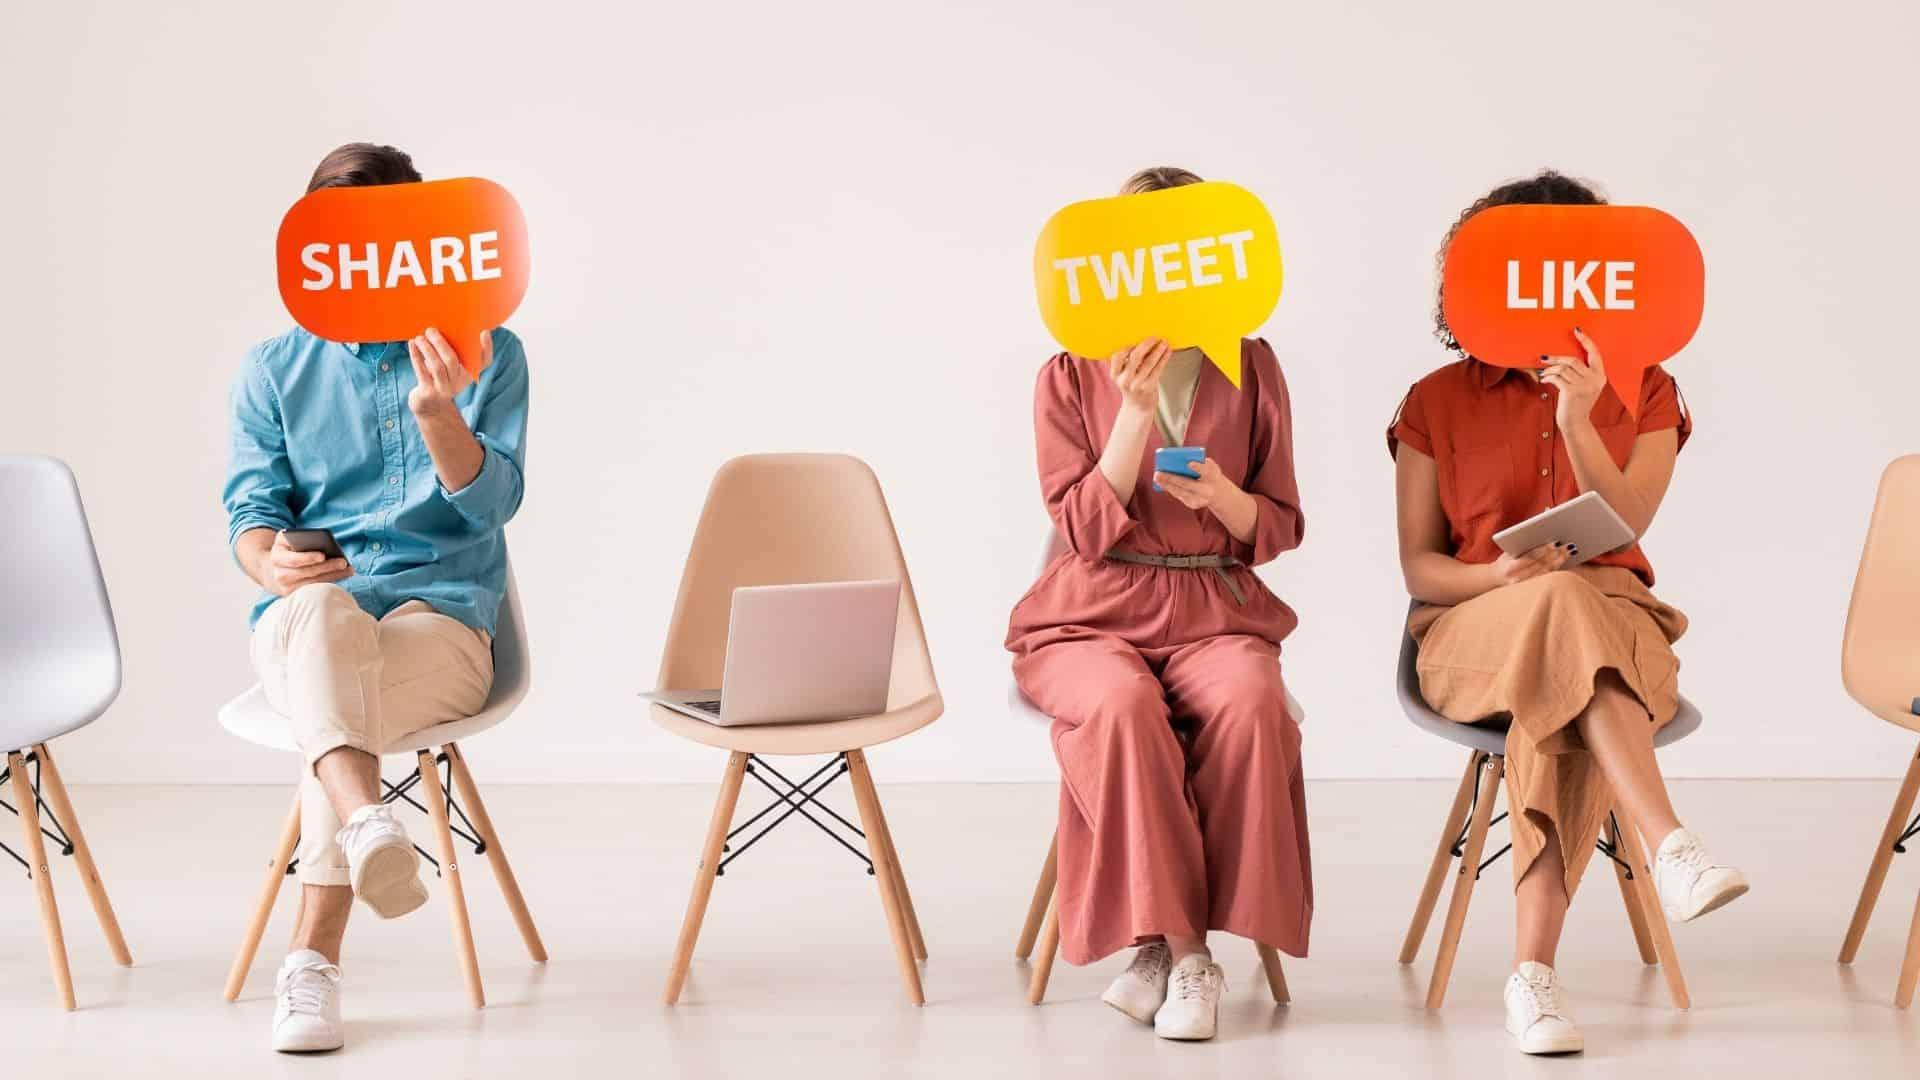 How Does Social Media Influence Consumer Behavior?